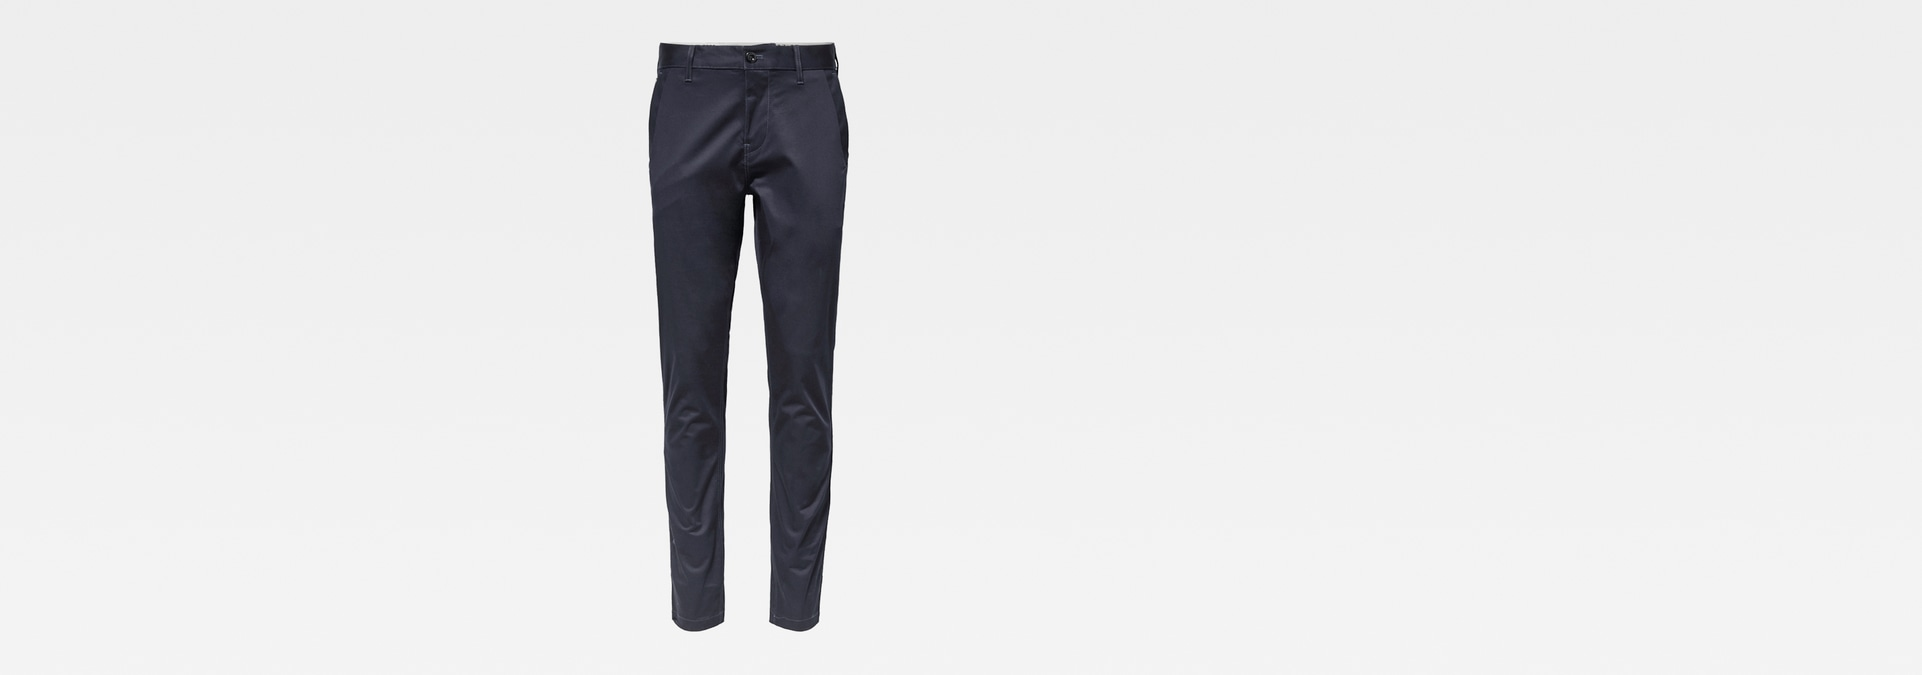 g star raw men pants bronson slim chino mazarine blue. Black Bedroom Furniture Sets. Home Design Ideas